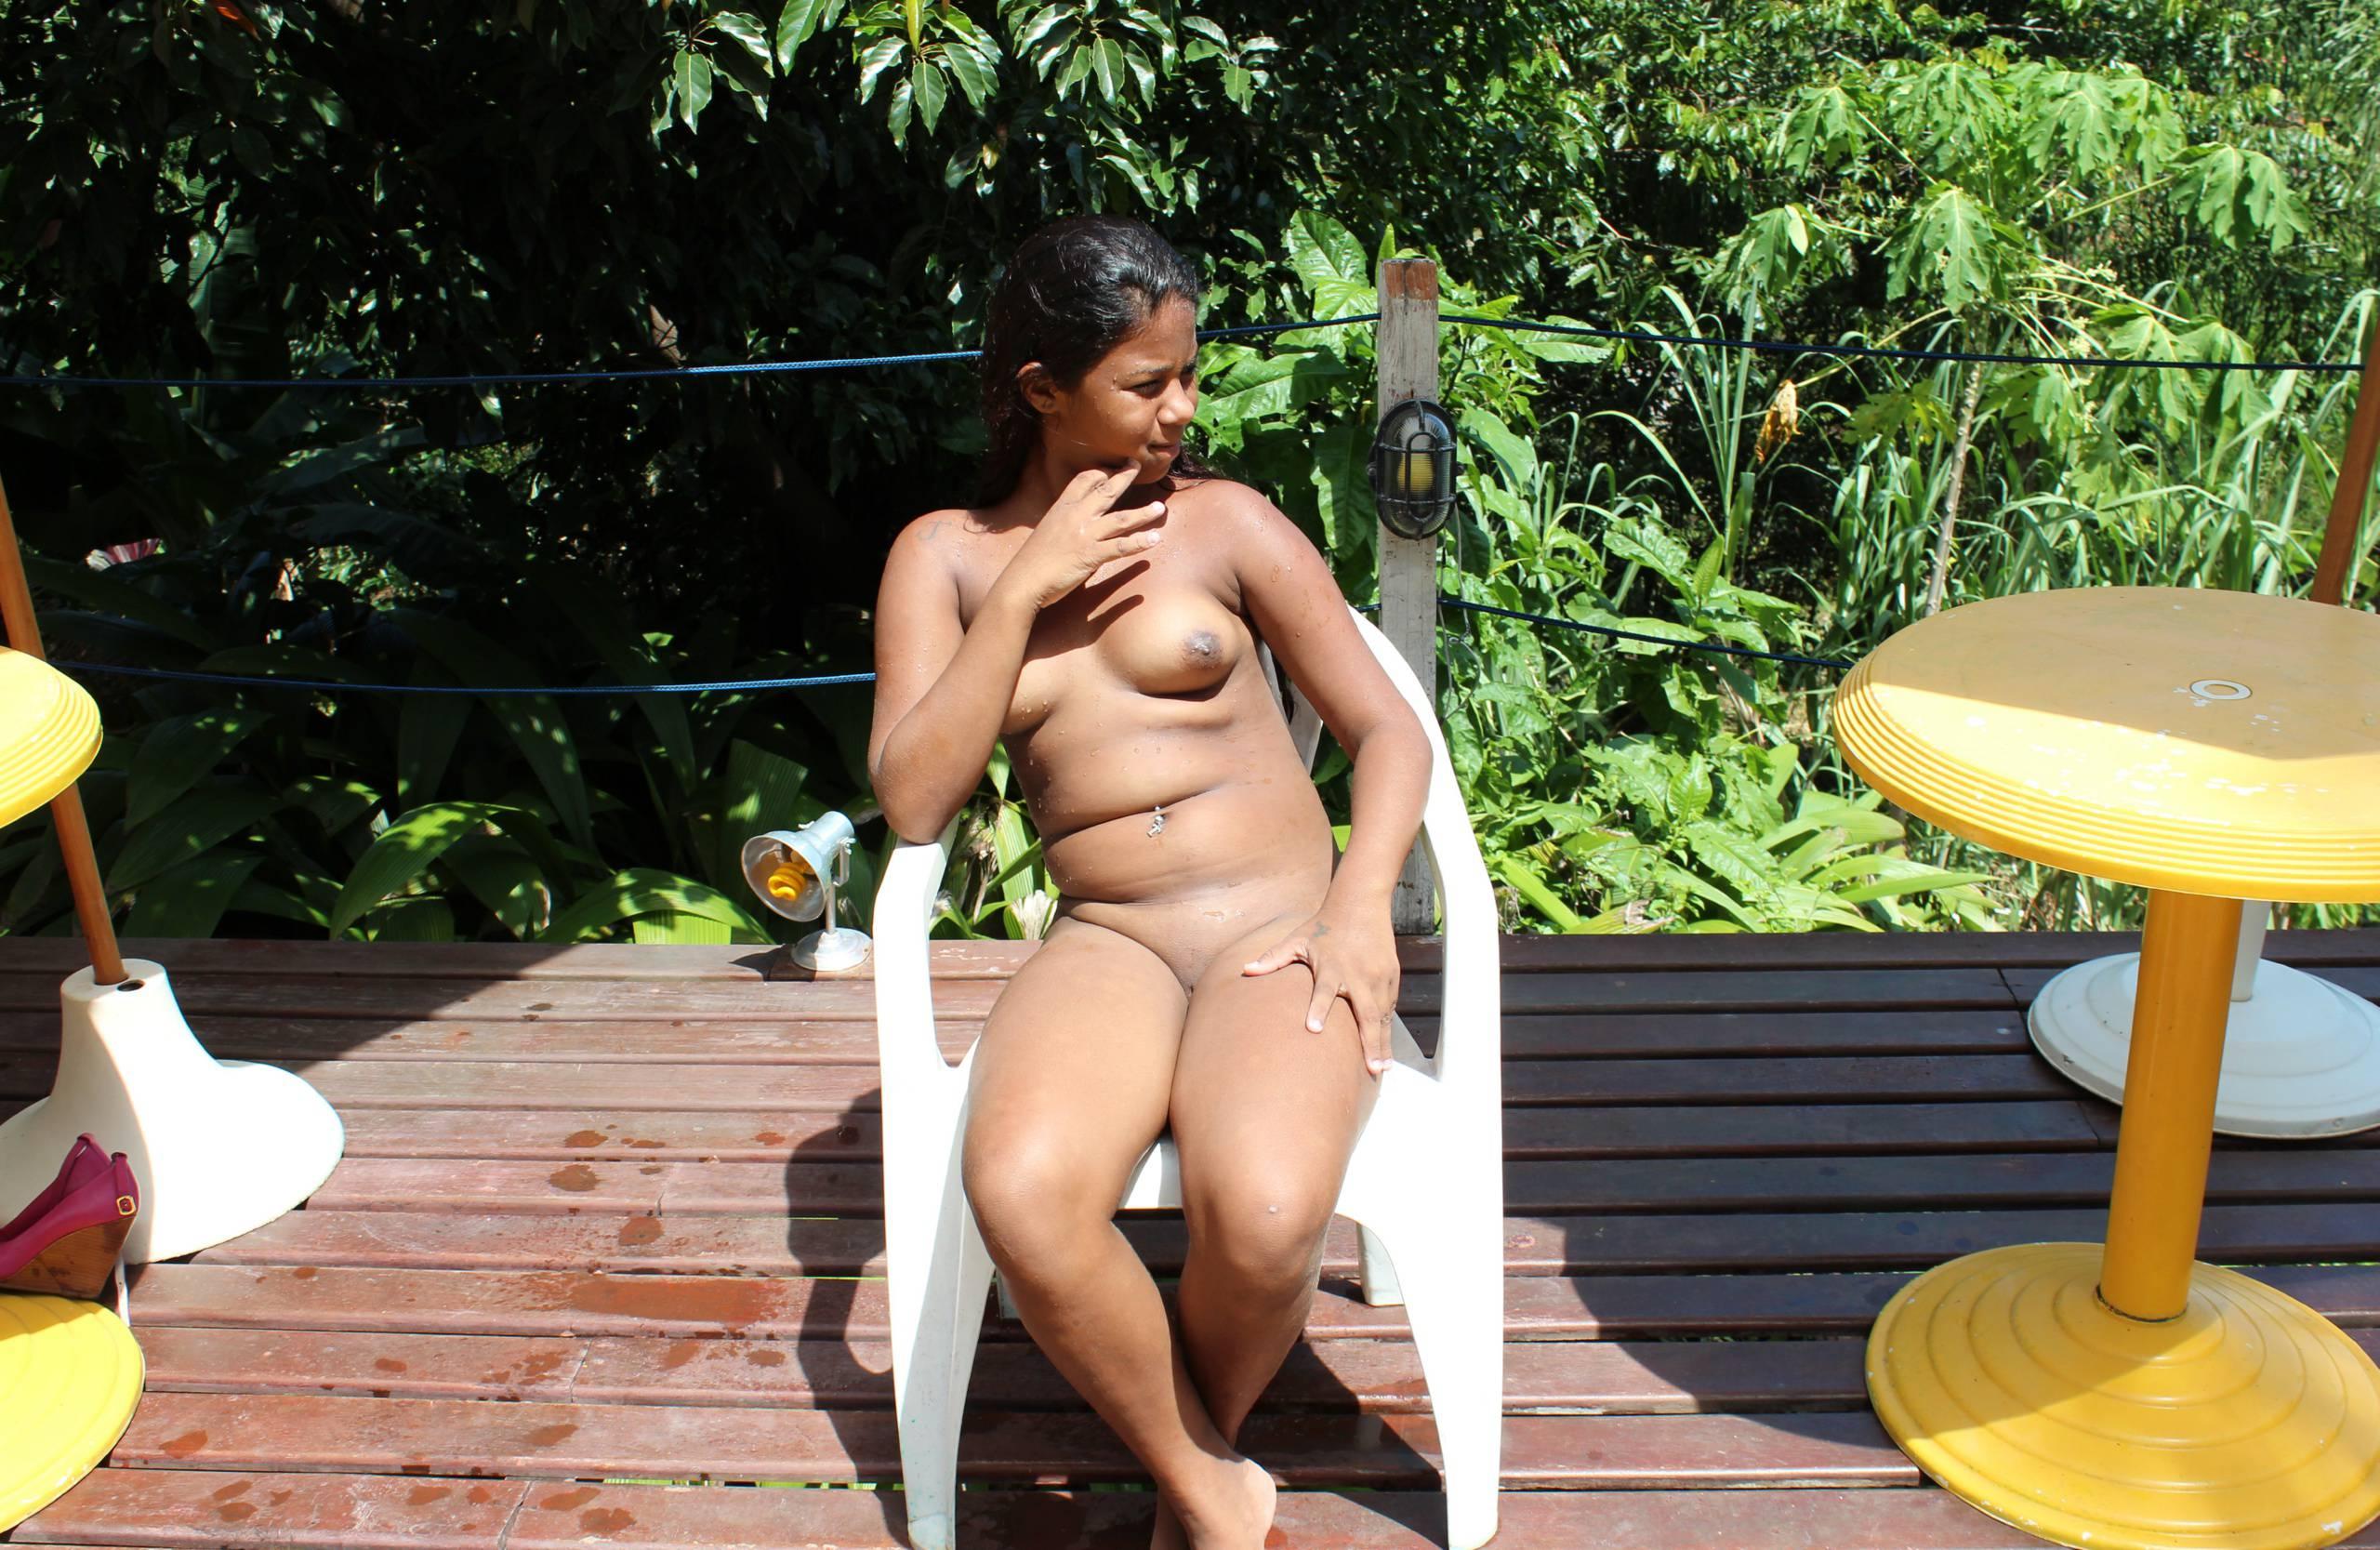 Purenudism Photos-Brazil Pool Sunbath - 3